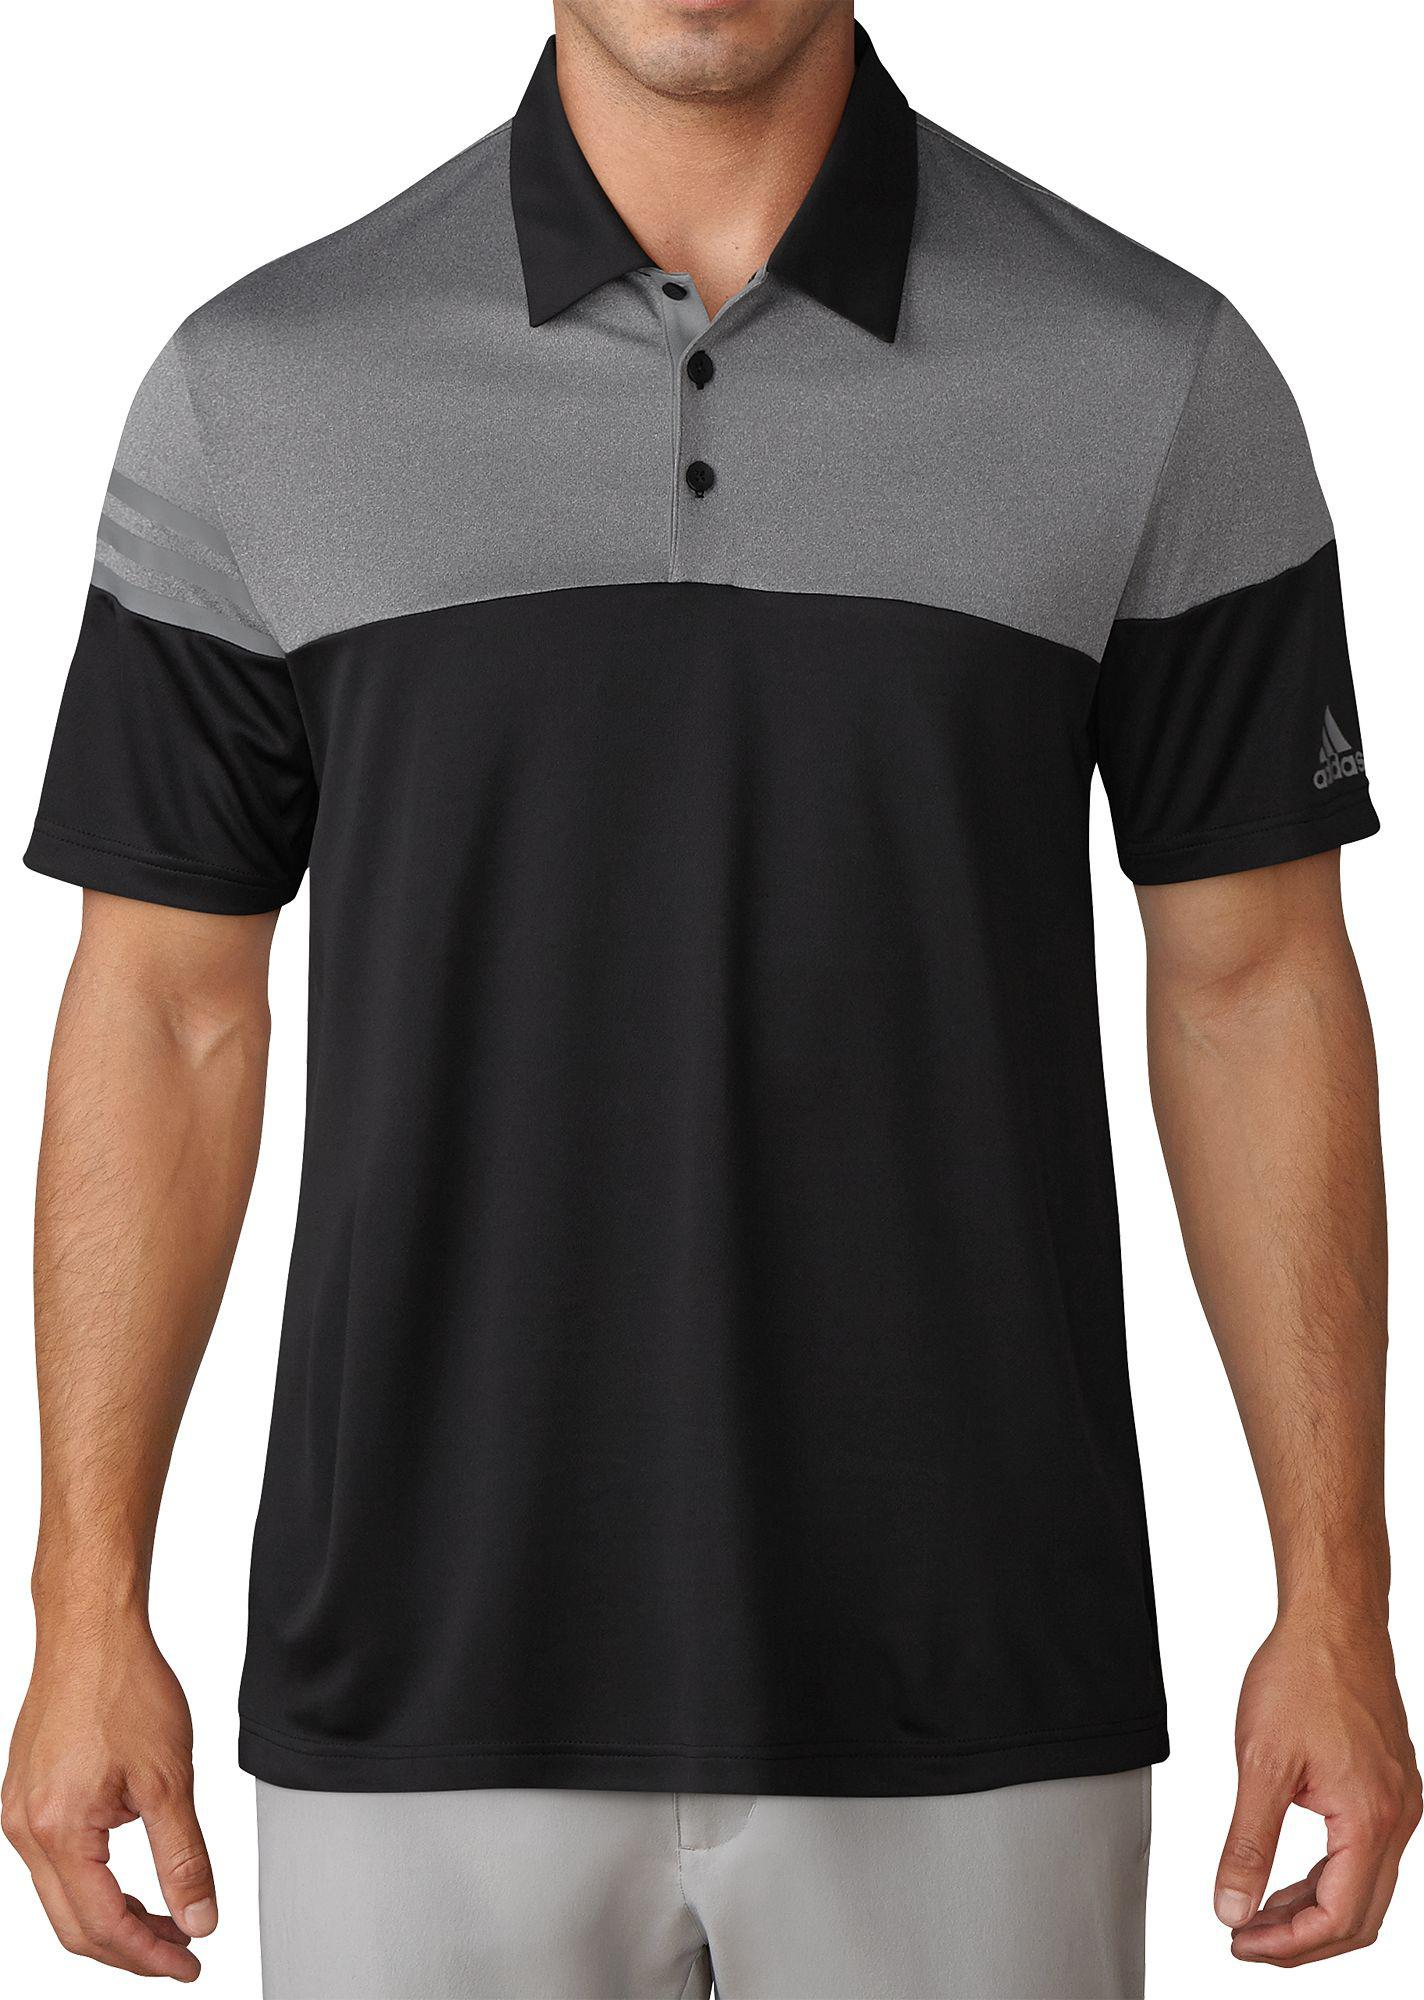 Looks - Golf adidas shirts photo video